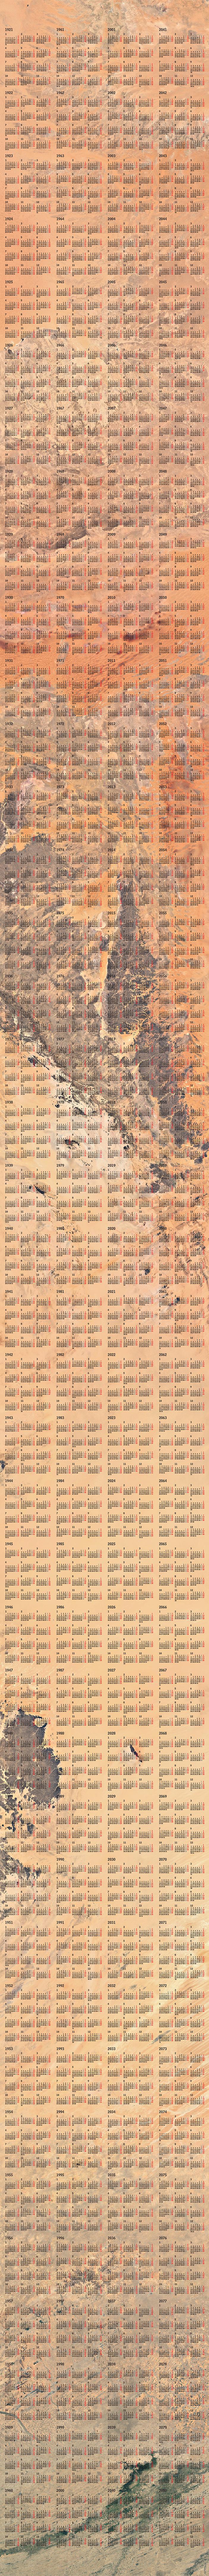 20210204_UNF0LD_CALENDAR_0001y-4000y_Sahara_Desert_2980x1480mm_Middle.jpg